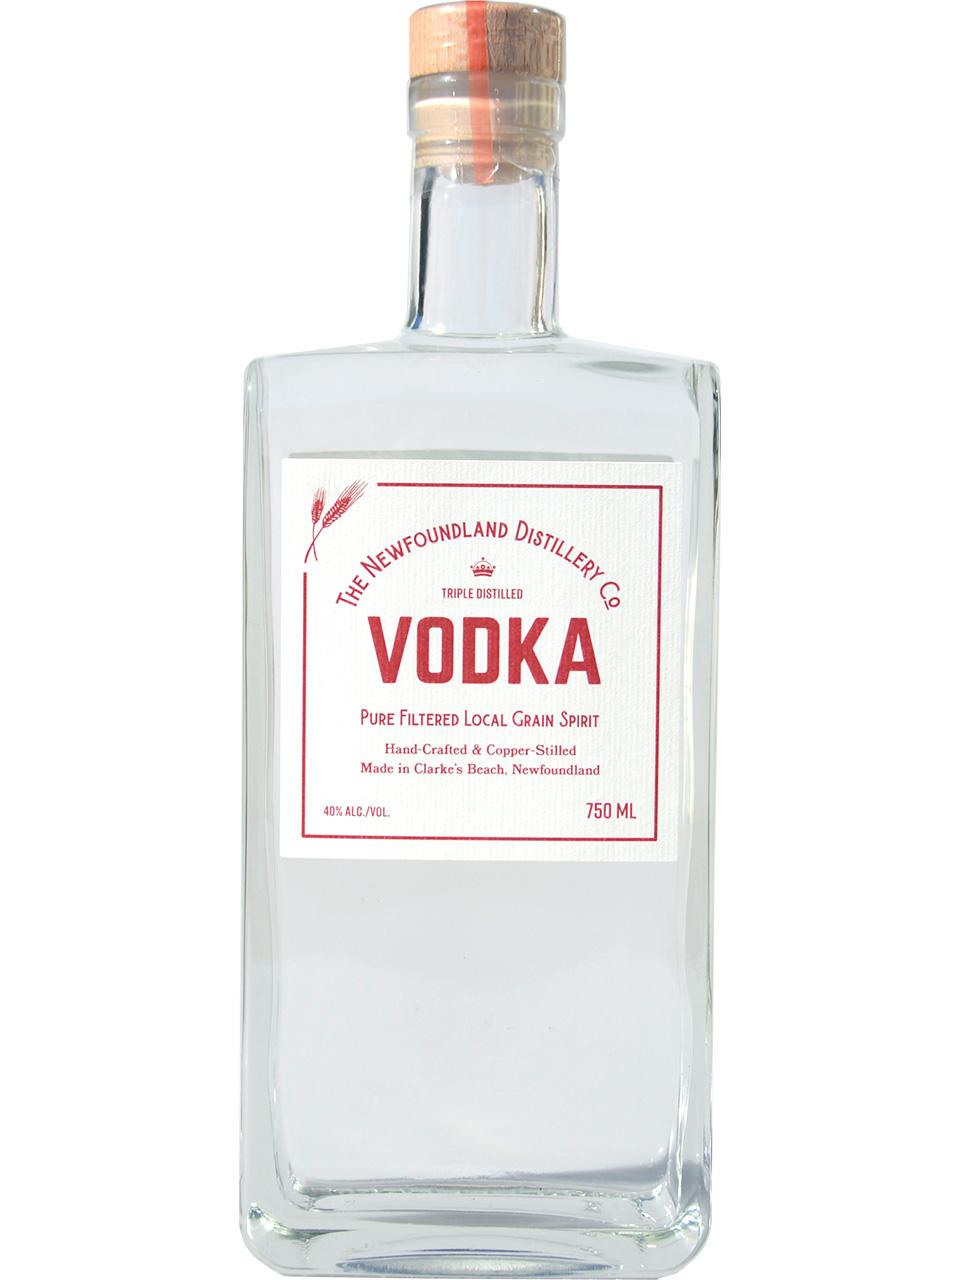 The Newfoundland Distillery Co. Vodka